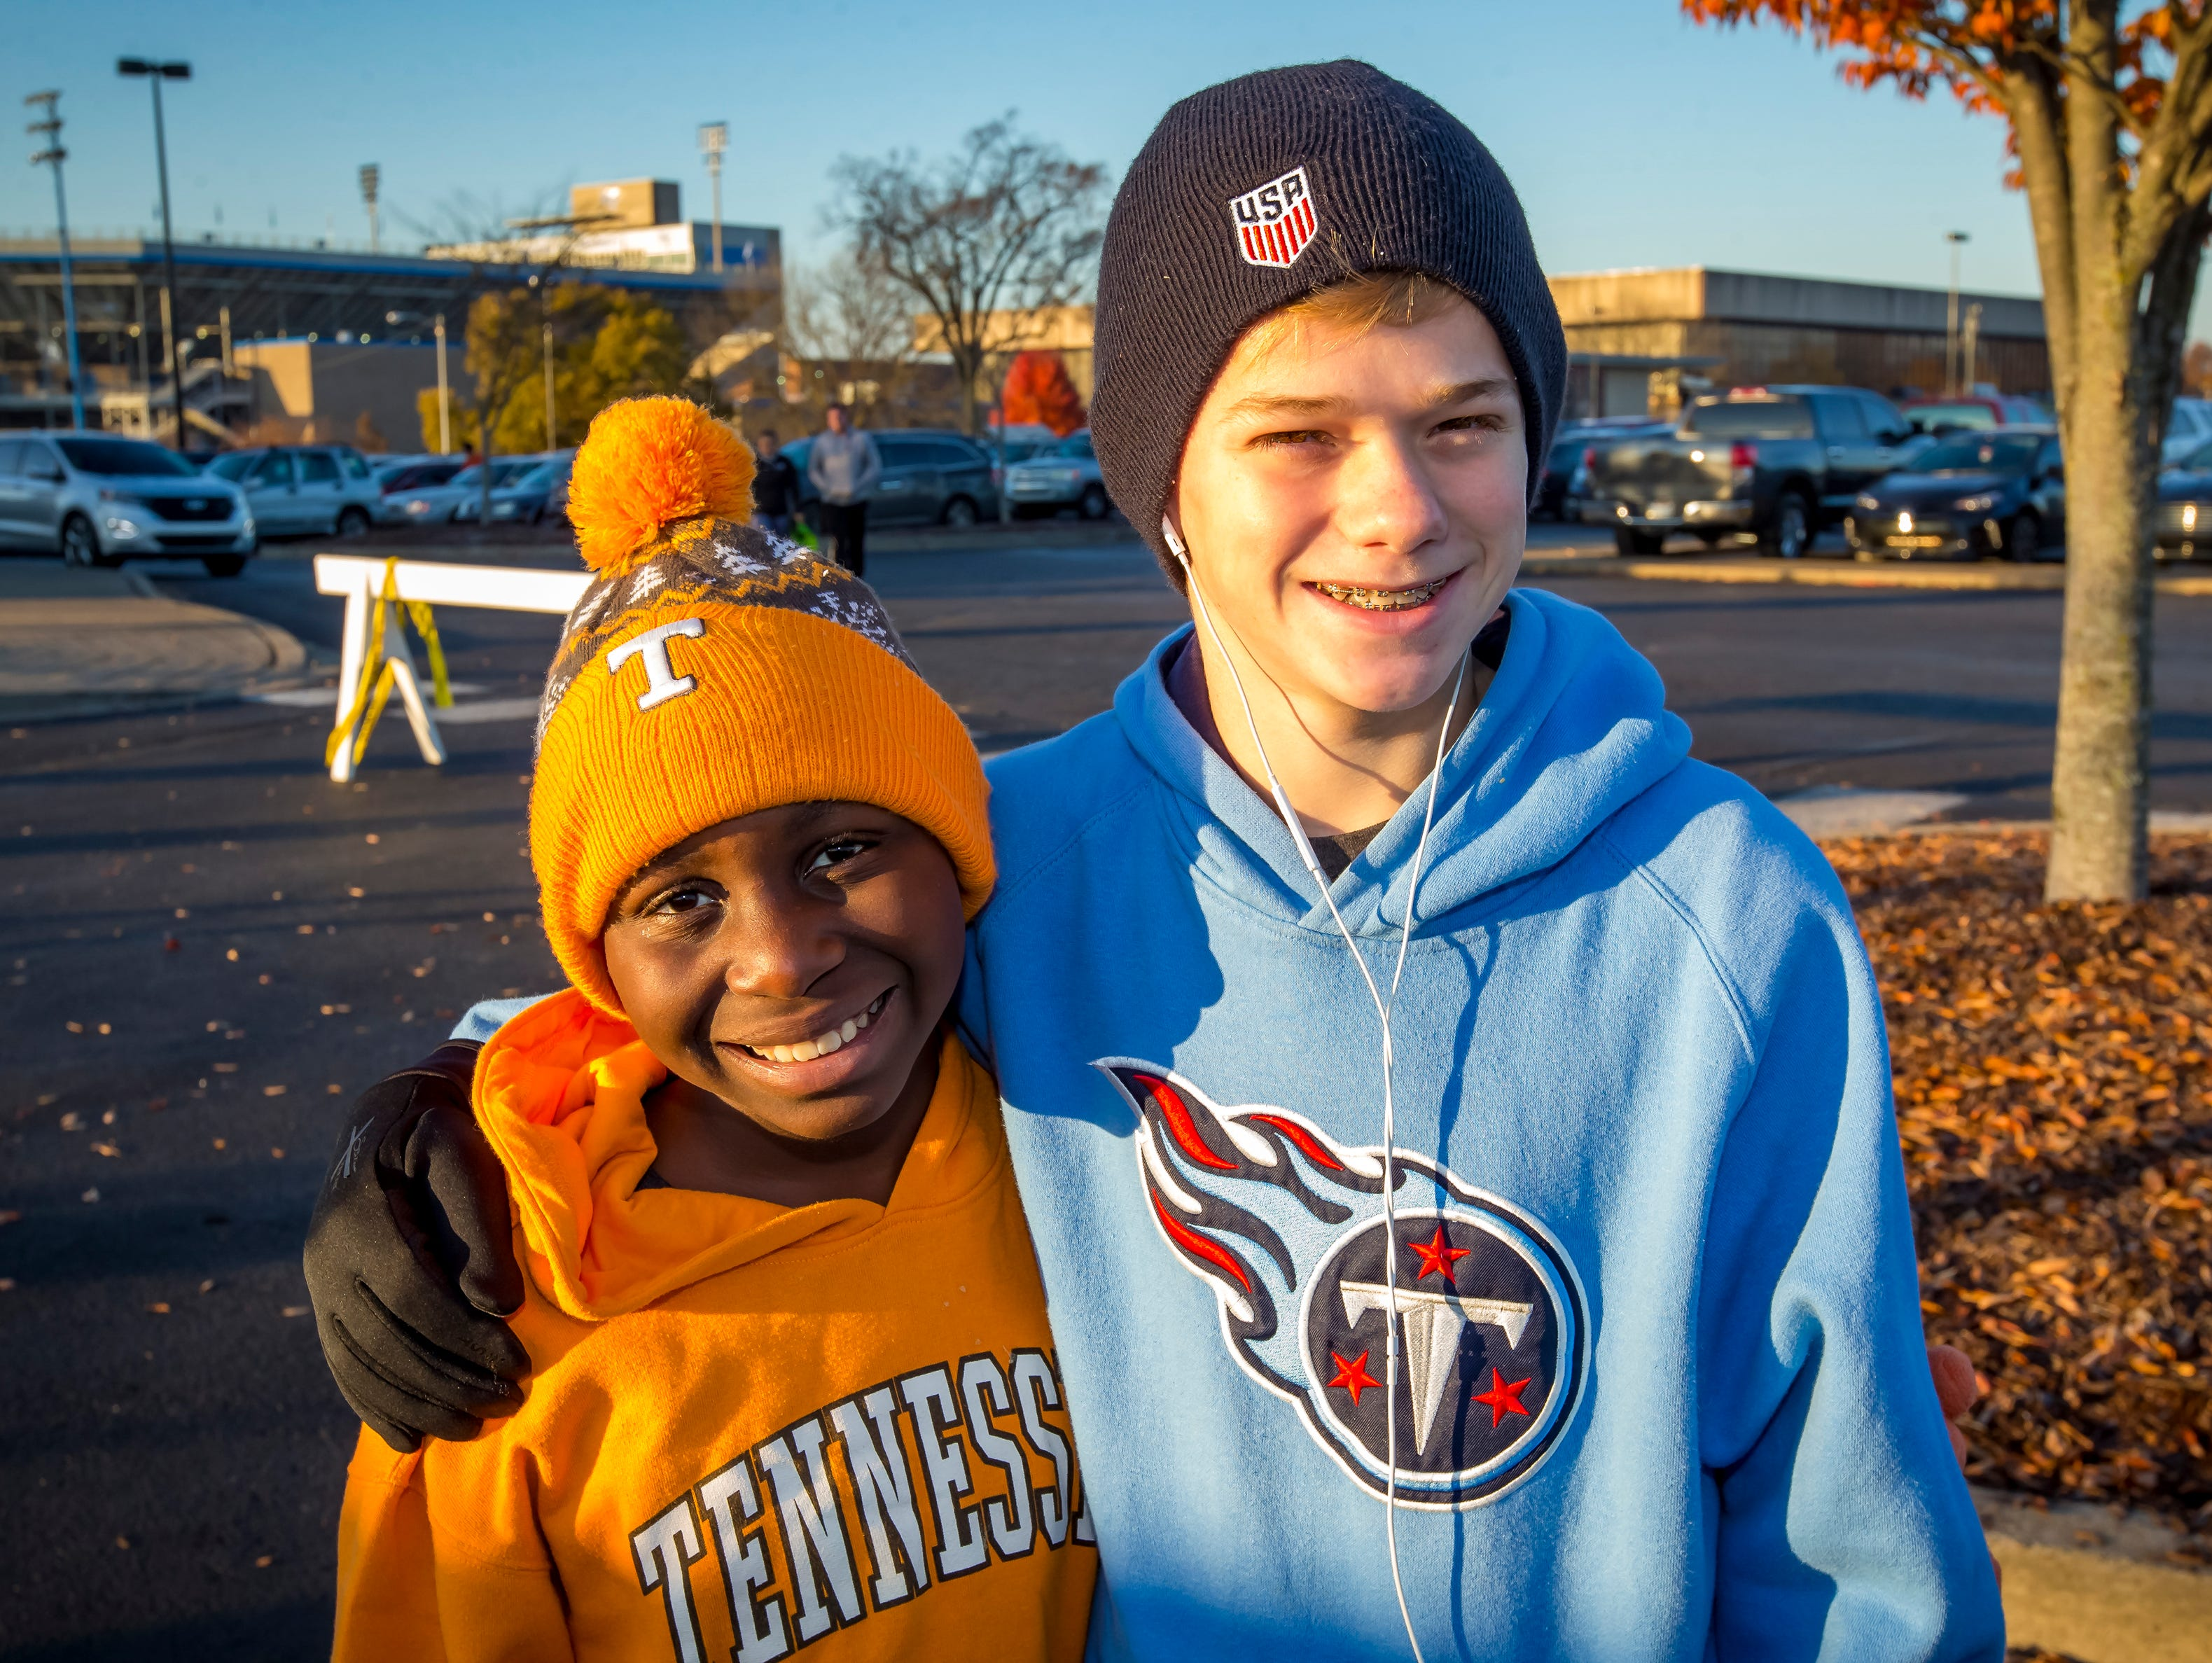 Erza and Knox Wosser take part in the Thanksgiving Day Borodash, a 4-mile walk/run through historic Murfreesboro.